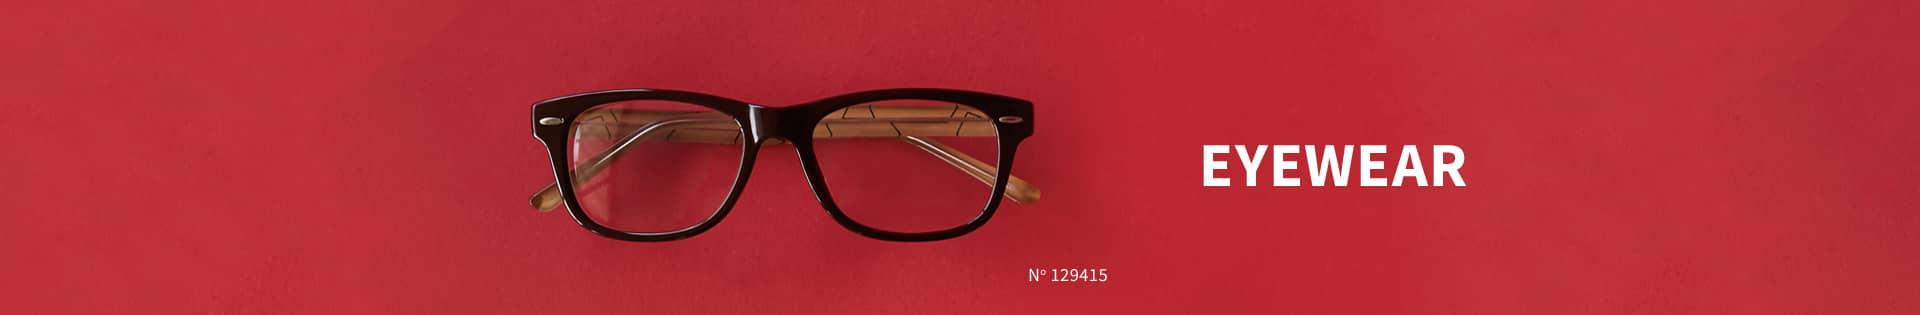 TrendBanner_eyewear